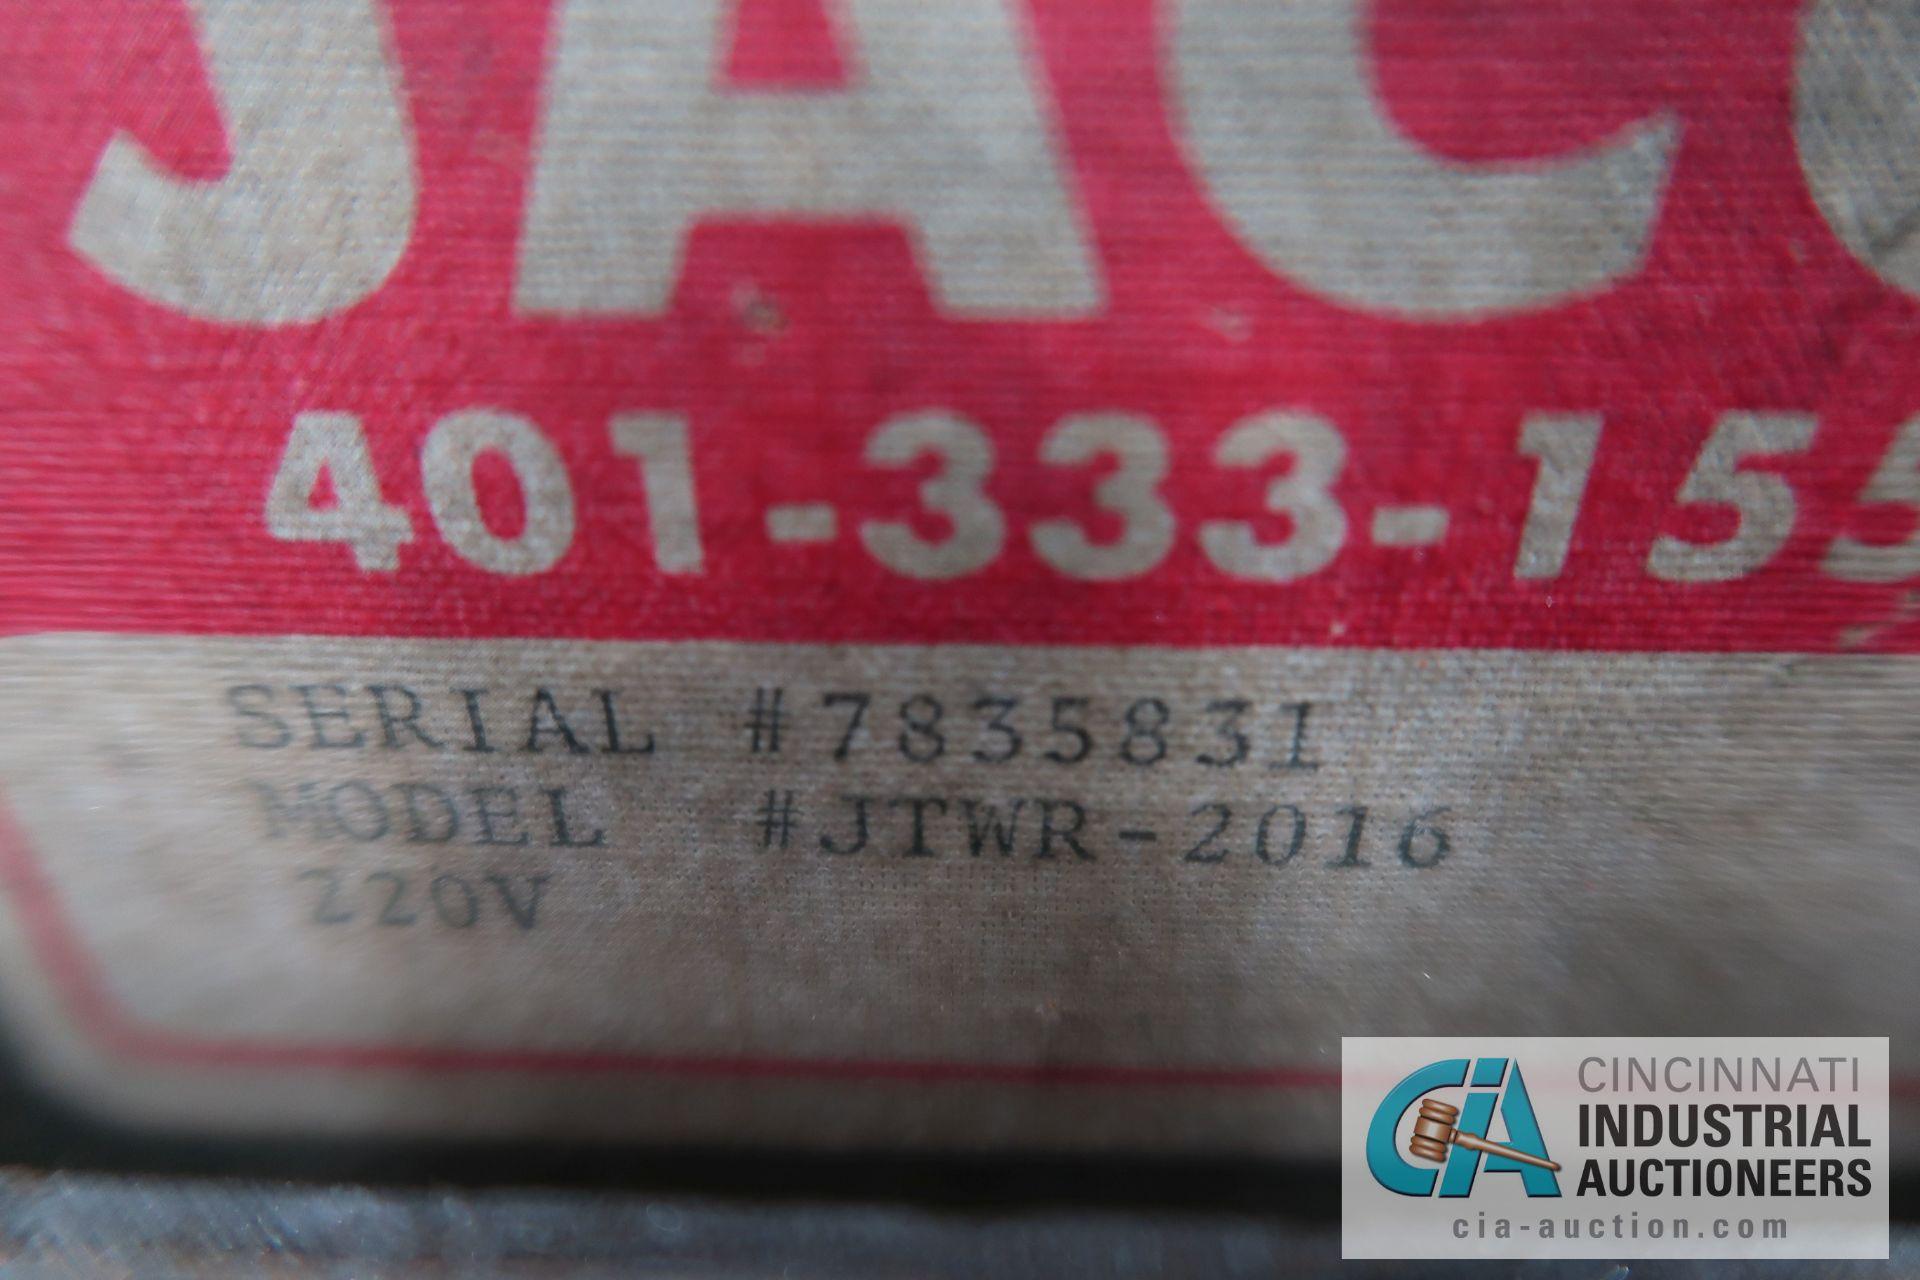 2,000 LB. CAPACITY JACO MODEL JTWR-2016 COIL REEL; S/N 7835831 - Image 5 of 5